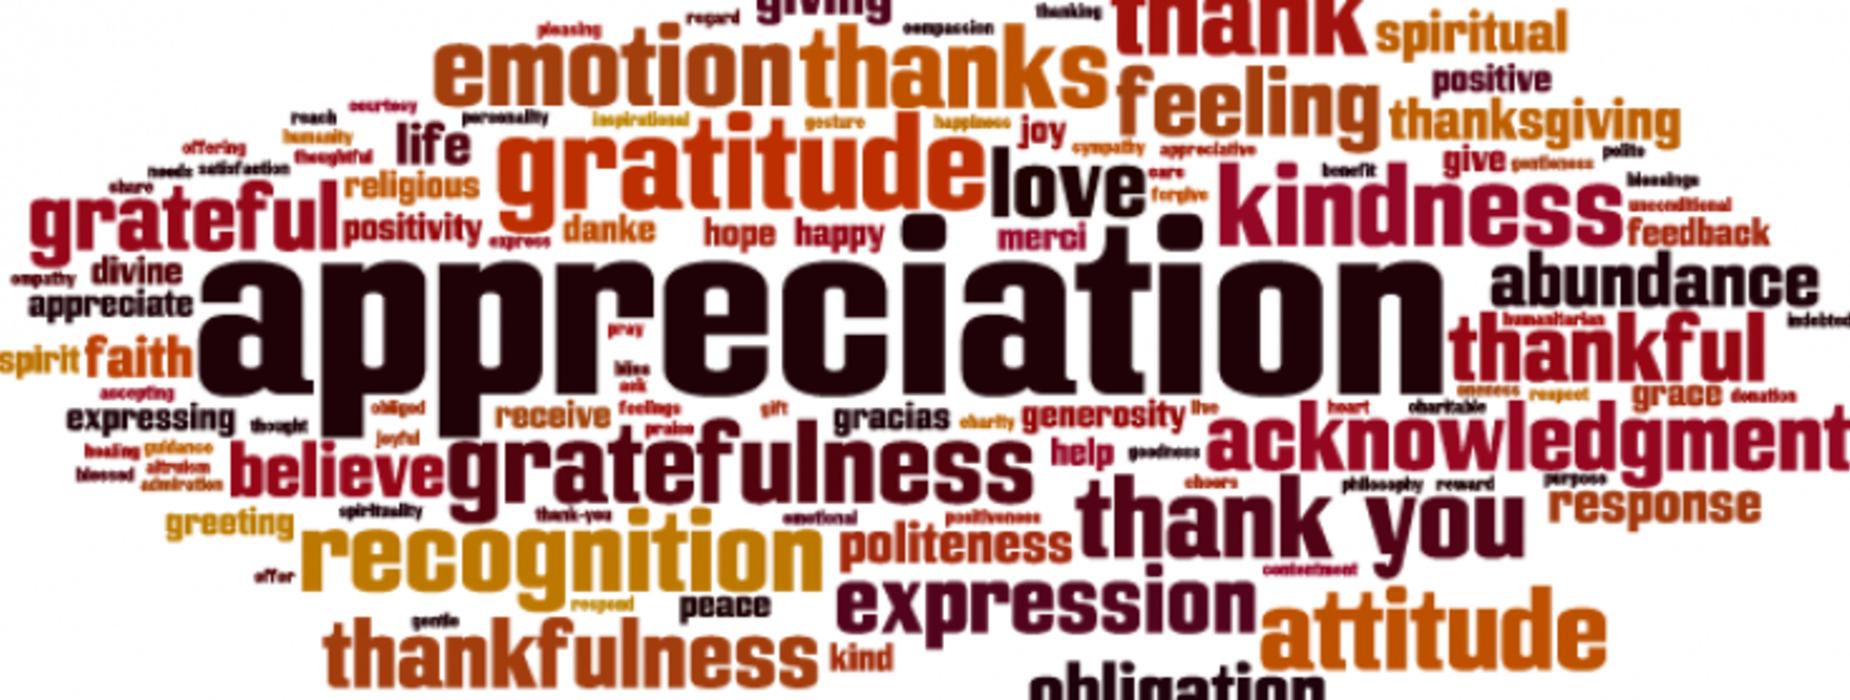 Employee Appreciation Week – February 25 – March 1, 2019.